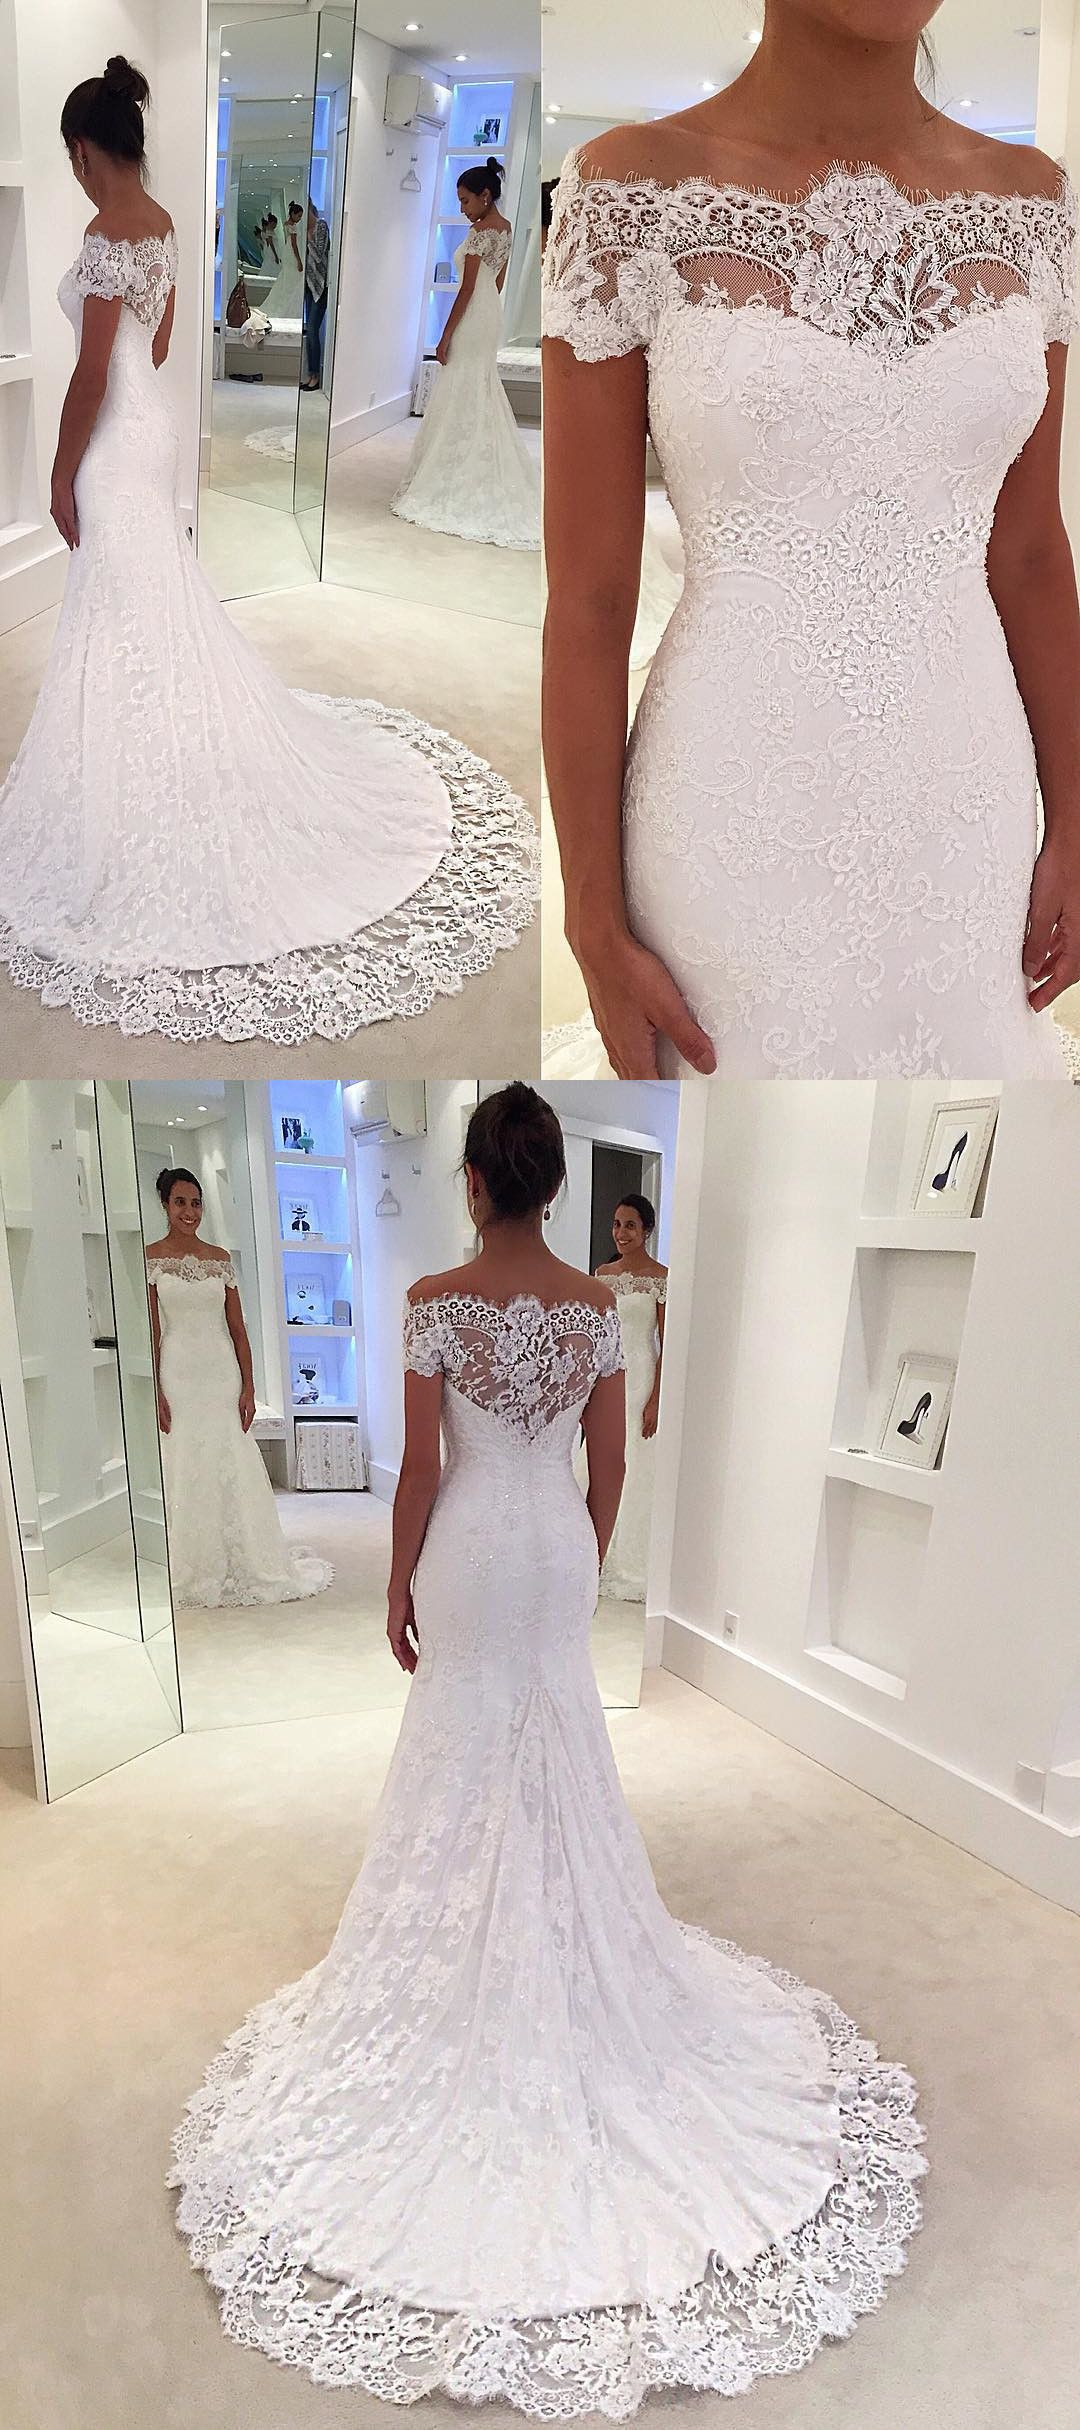 Gorgeous Off The Shoulder White Lace Mermaid Wedding Dress Lace Mermaid Wedding Dress Bridal Dresses Lace Online Wedding Dress [ 2430 x 1080 Pixel ]